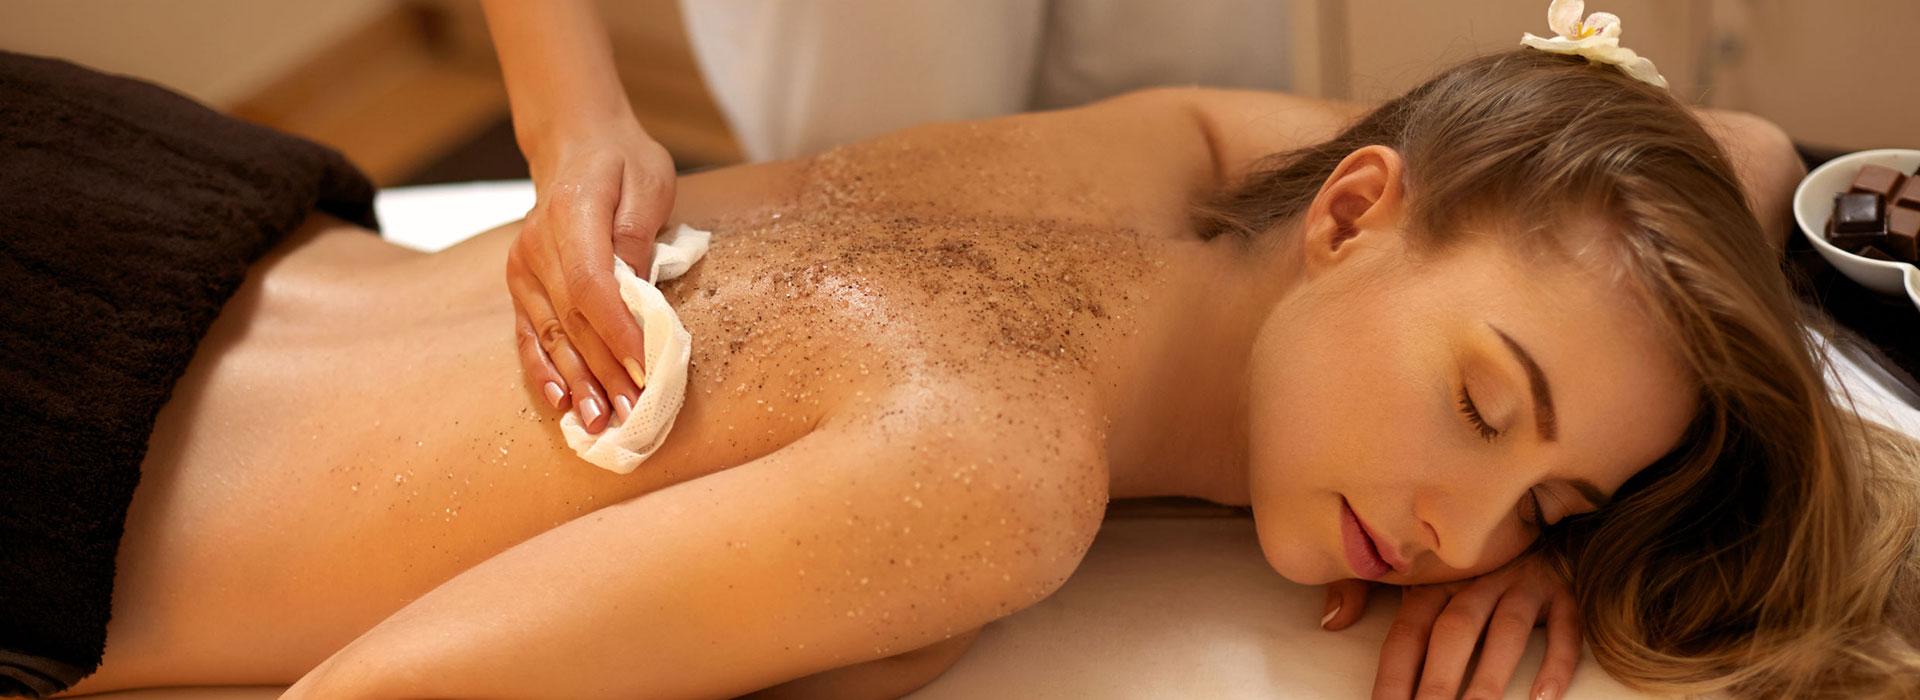 Skincare and masssage